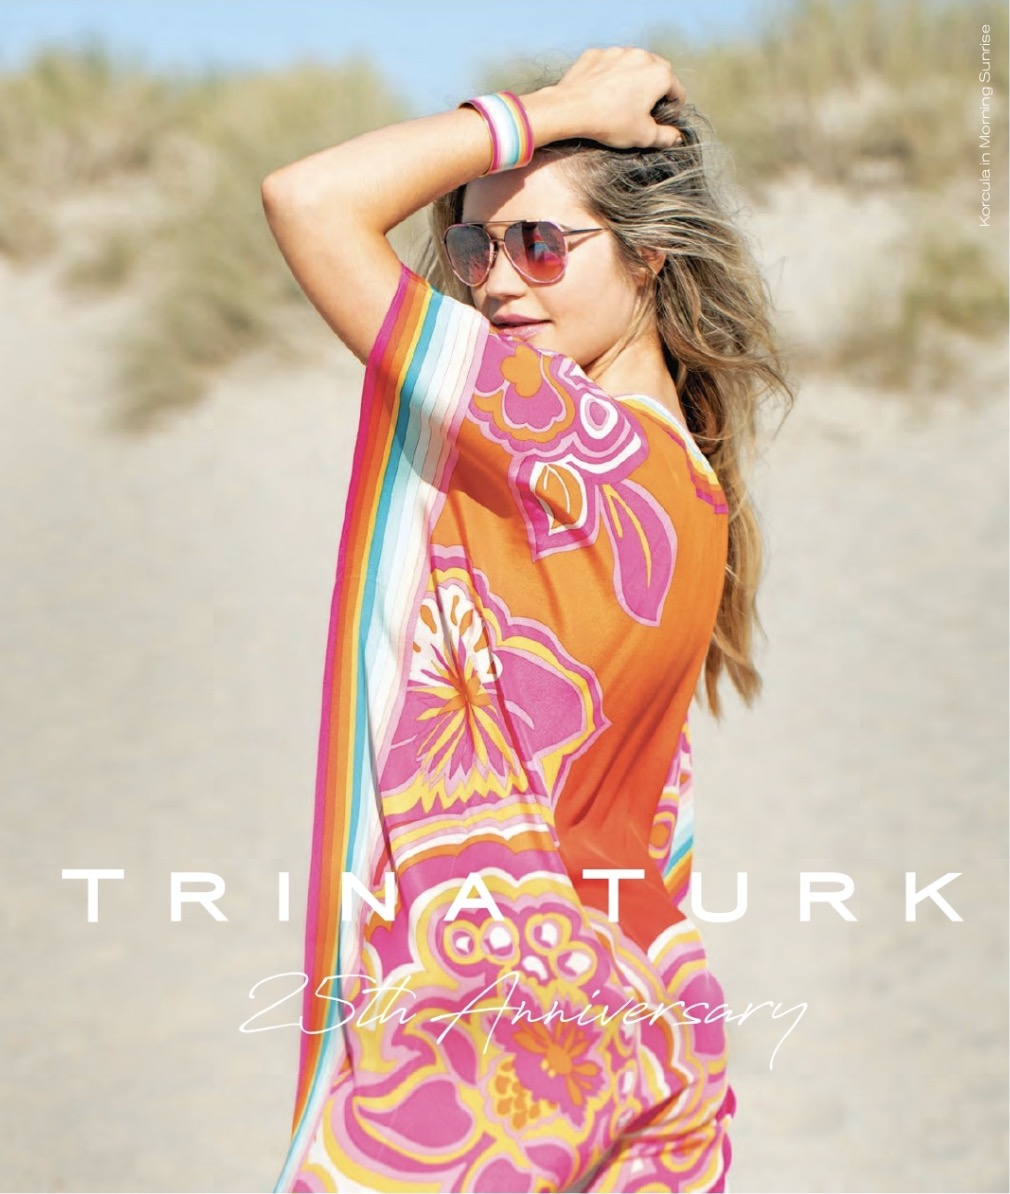 Trina Turk Glasses